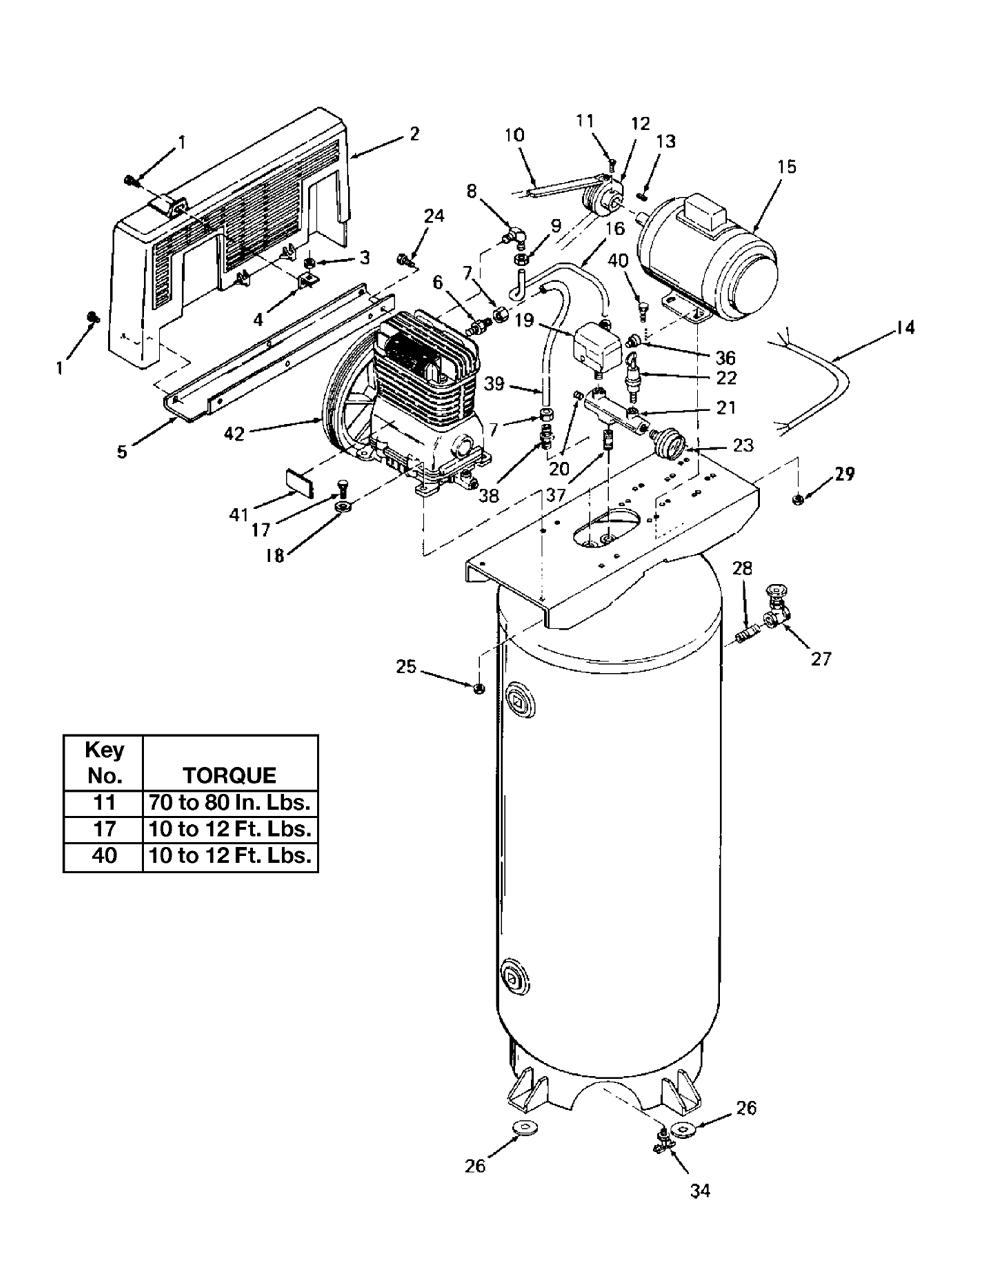 PALC6560V-Devilbiss-T0-PB-1Break Down